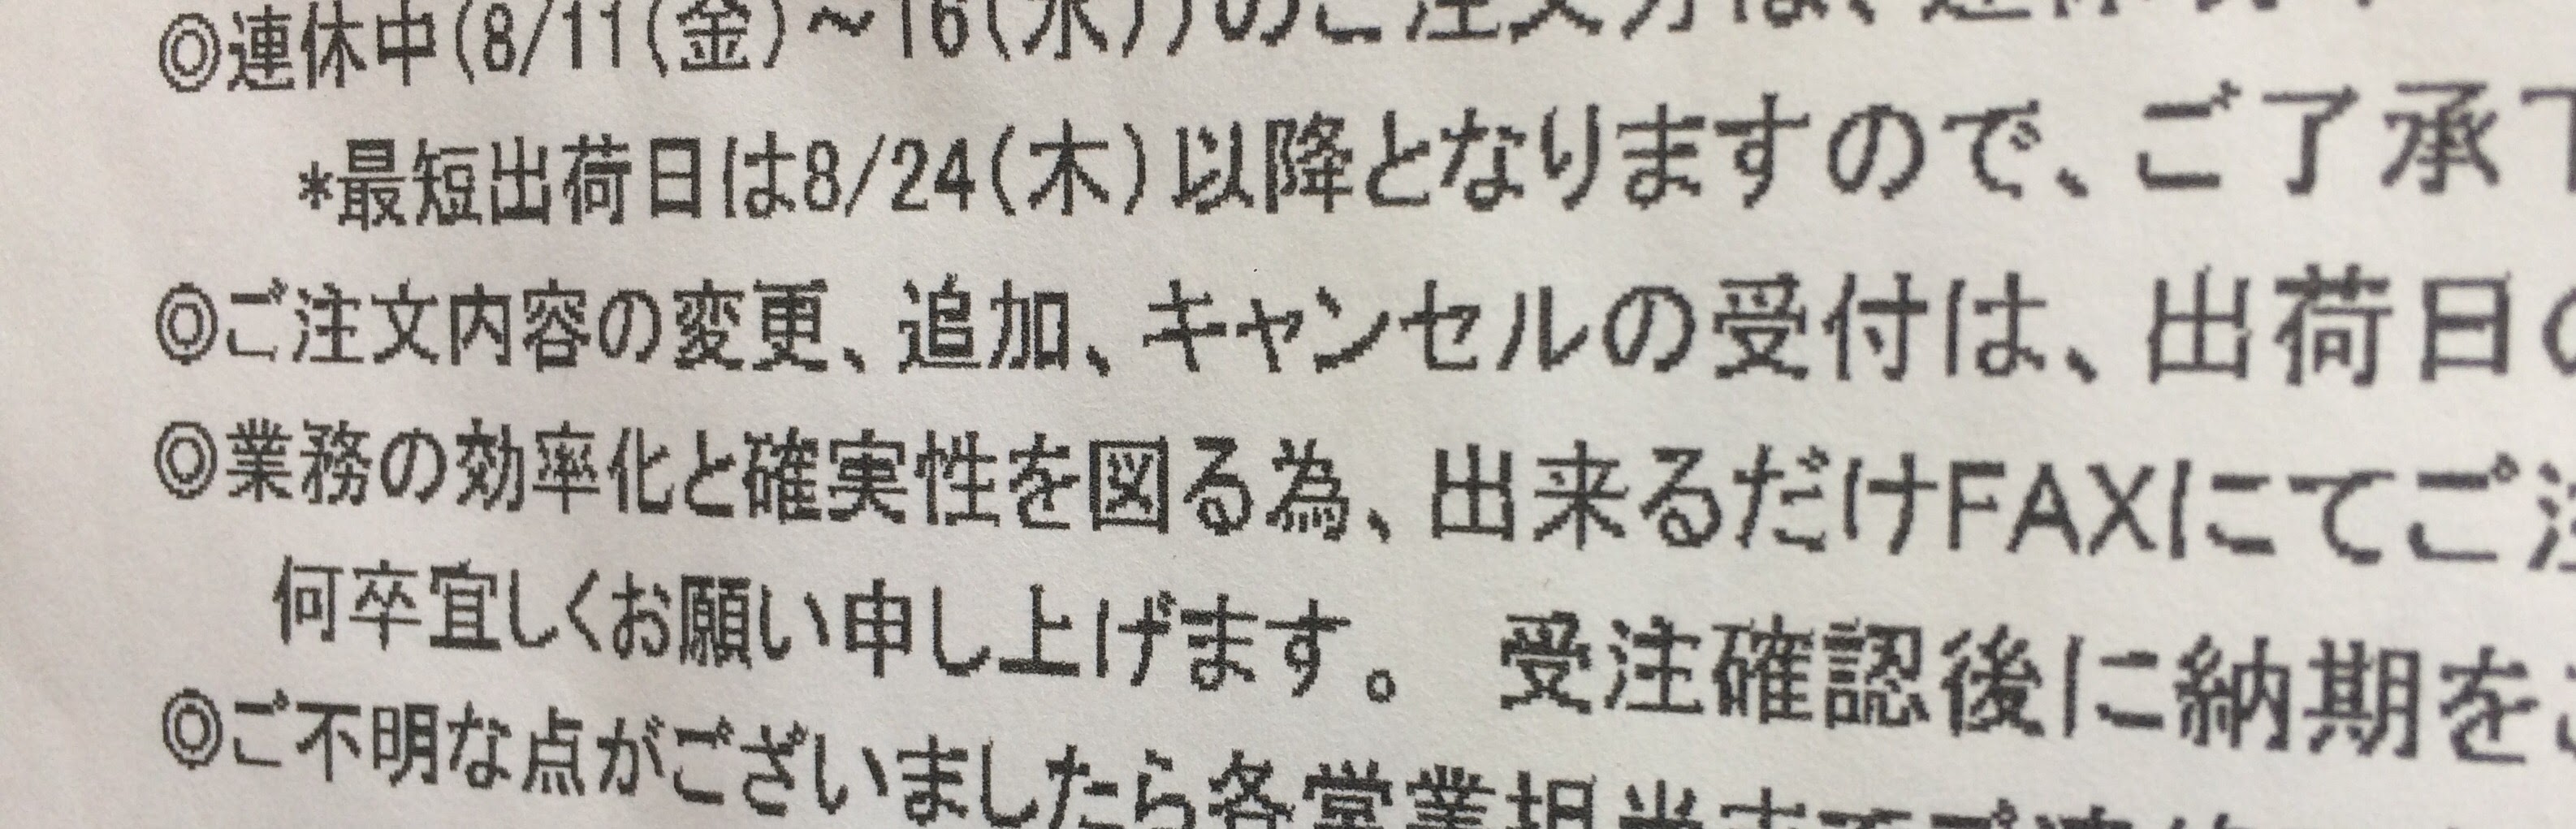 IMG_3433.JPG